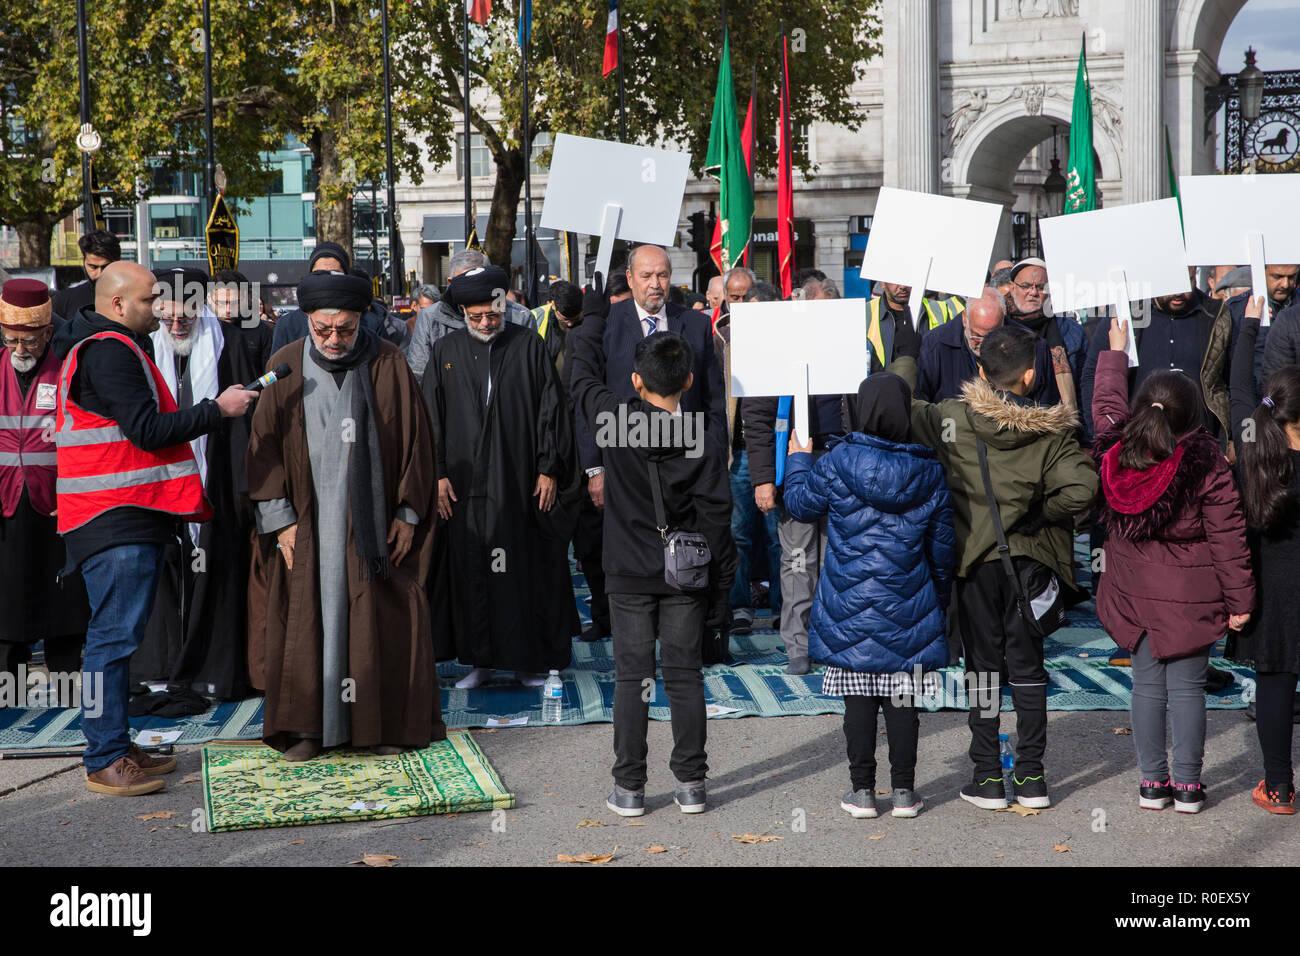 Imam Hussein Stock Photos & Imam Hussein Stock Images - Alamy